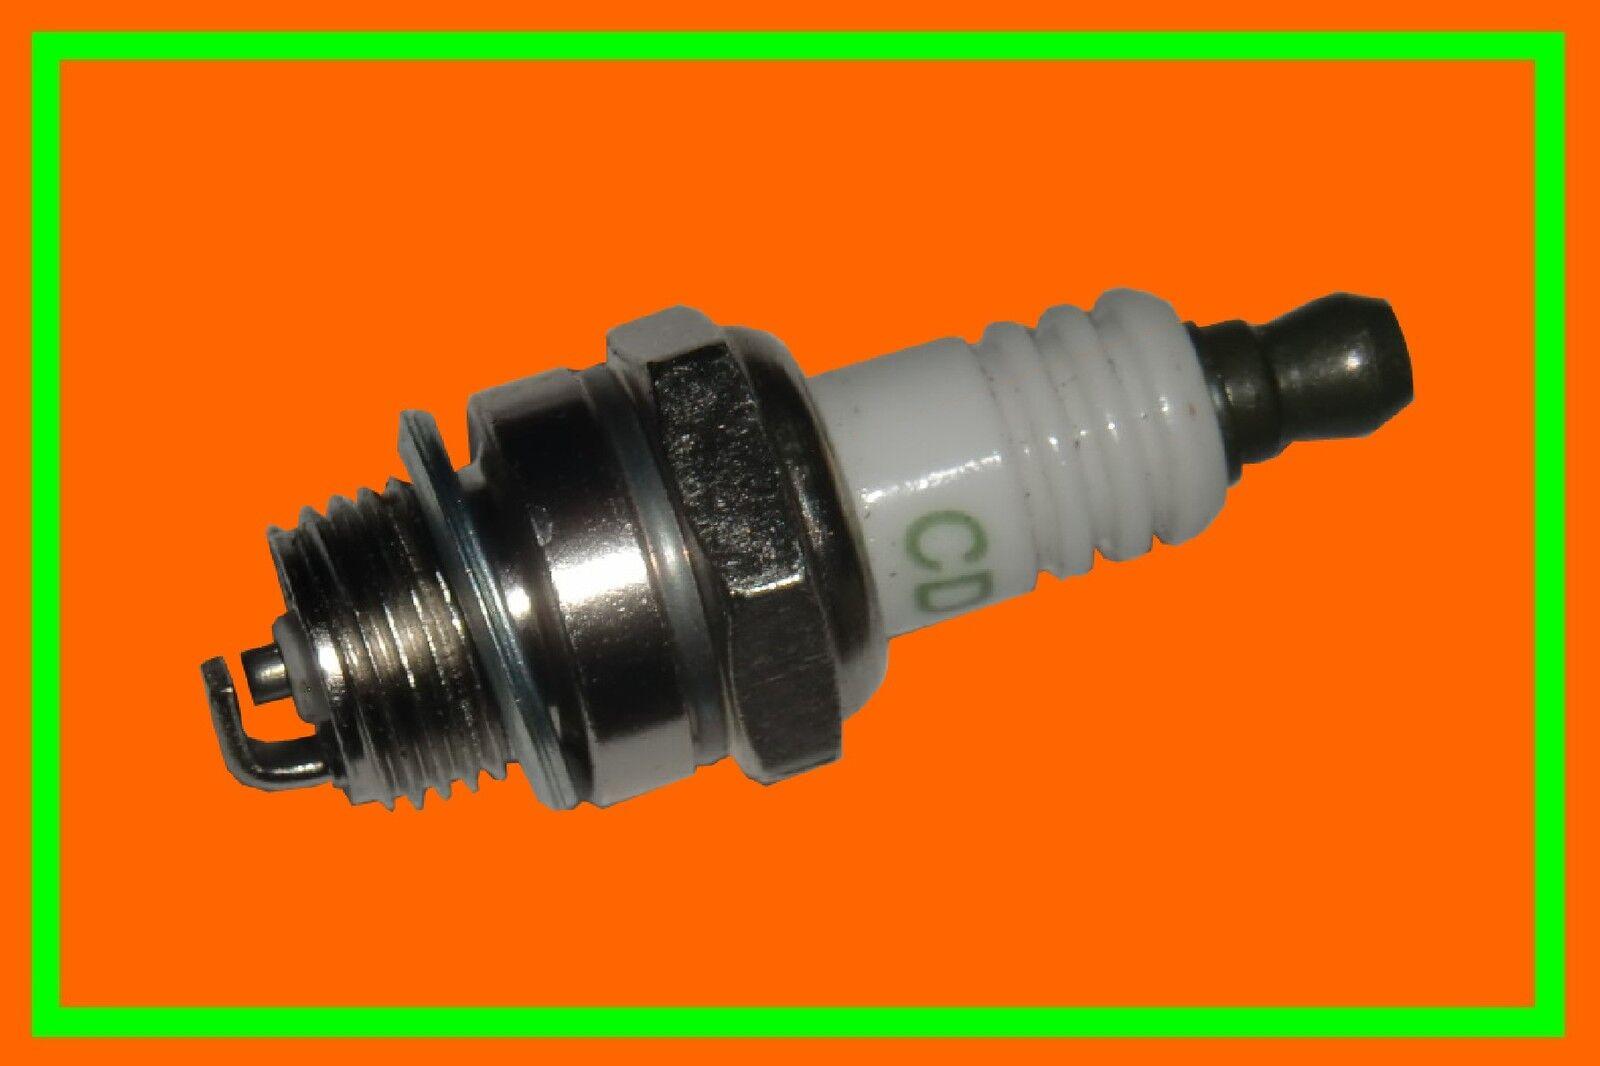 2m Starterseil Seil 3,5mm passend STIHL 039 034 036 044 MS390 MS340 MS360 MS440